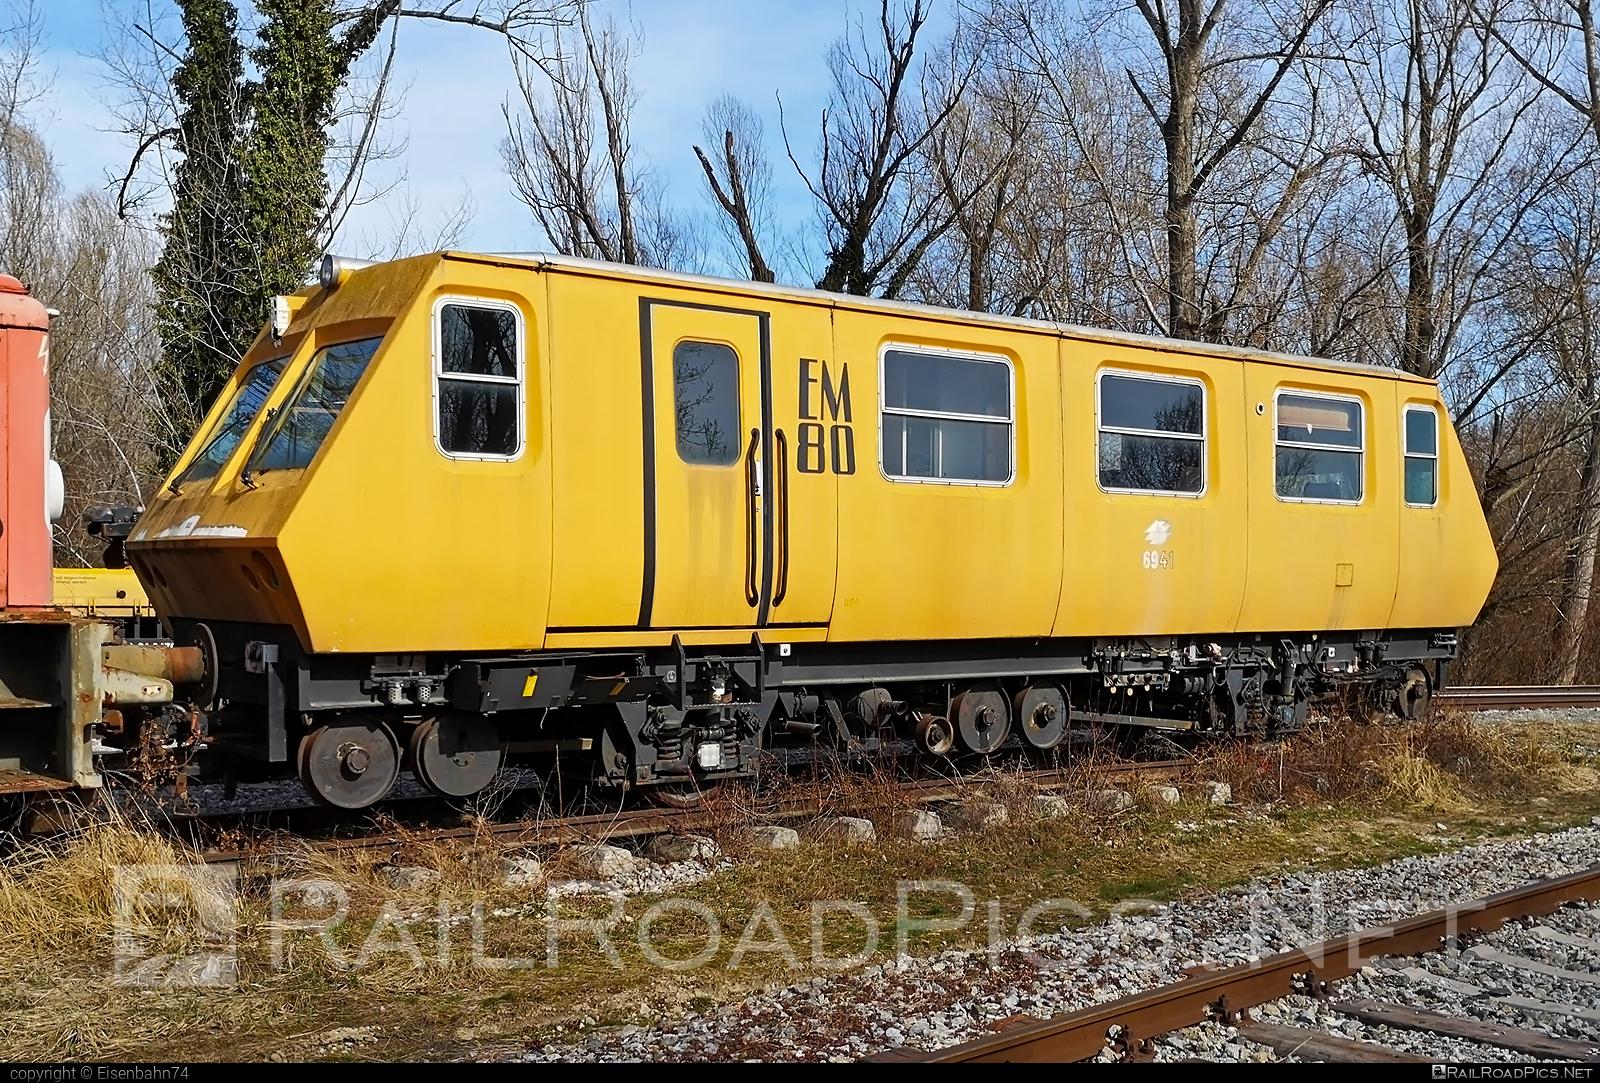 Plasser & Theurer EM80 - 6941 operated by WIENER LINIEN GmbH & Co KG #em80 #plasserandtheurer #plassertheurer #plassertheurerem80 #wienerlinien